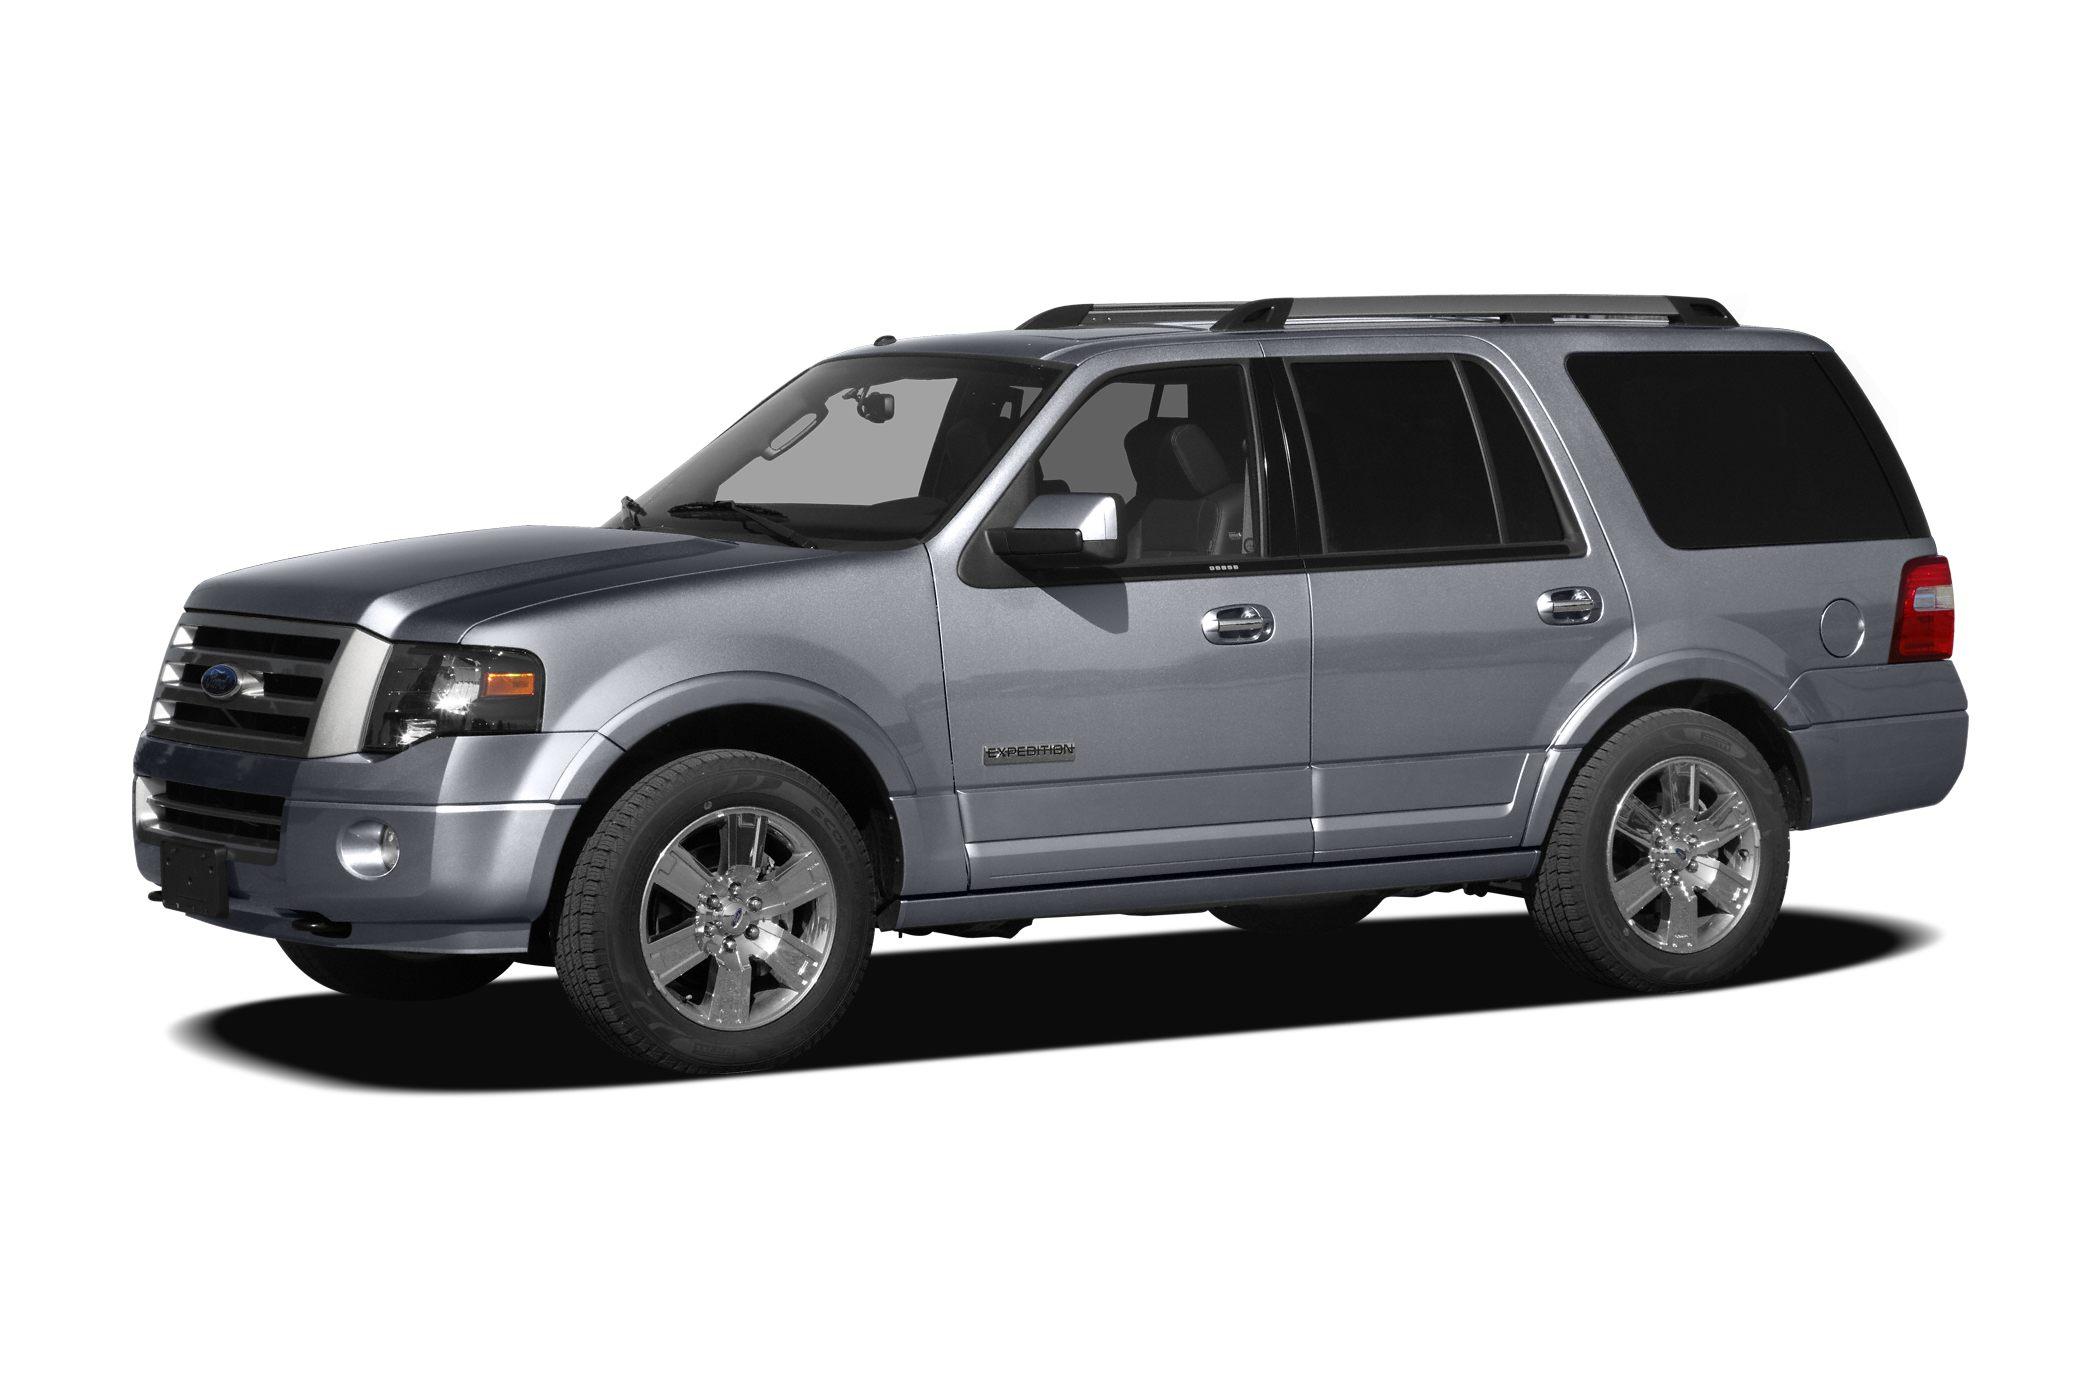 2010 Ford Expedition Eddie Bauer Miles 164975Stock AEA17883 VIN 1FMJU1H54AEA17883